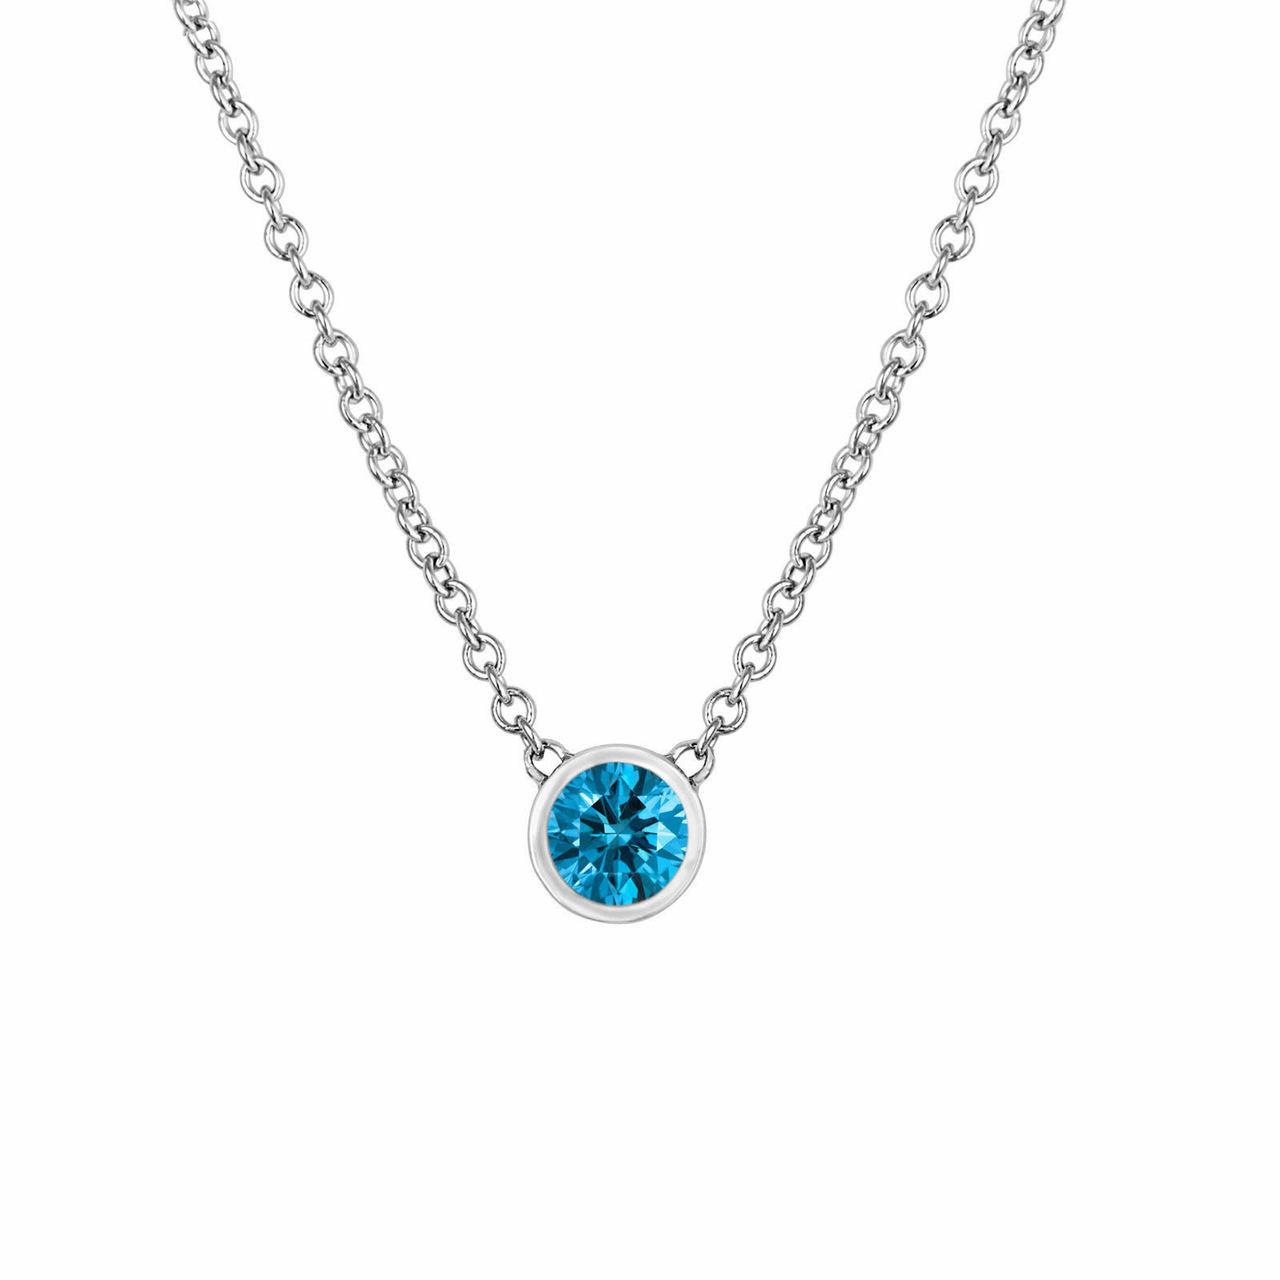 050 carat blue diamond pendant platinum diamond necklace diamond 050 carat blue diamond pendant platinum diamond necklace diamond by the yard necklace solitaire pendant aloadofball Image collections